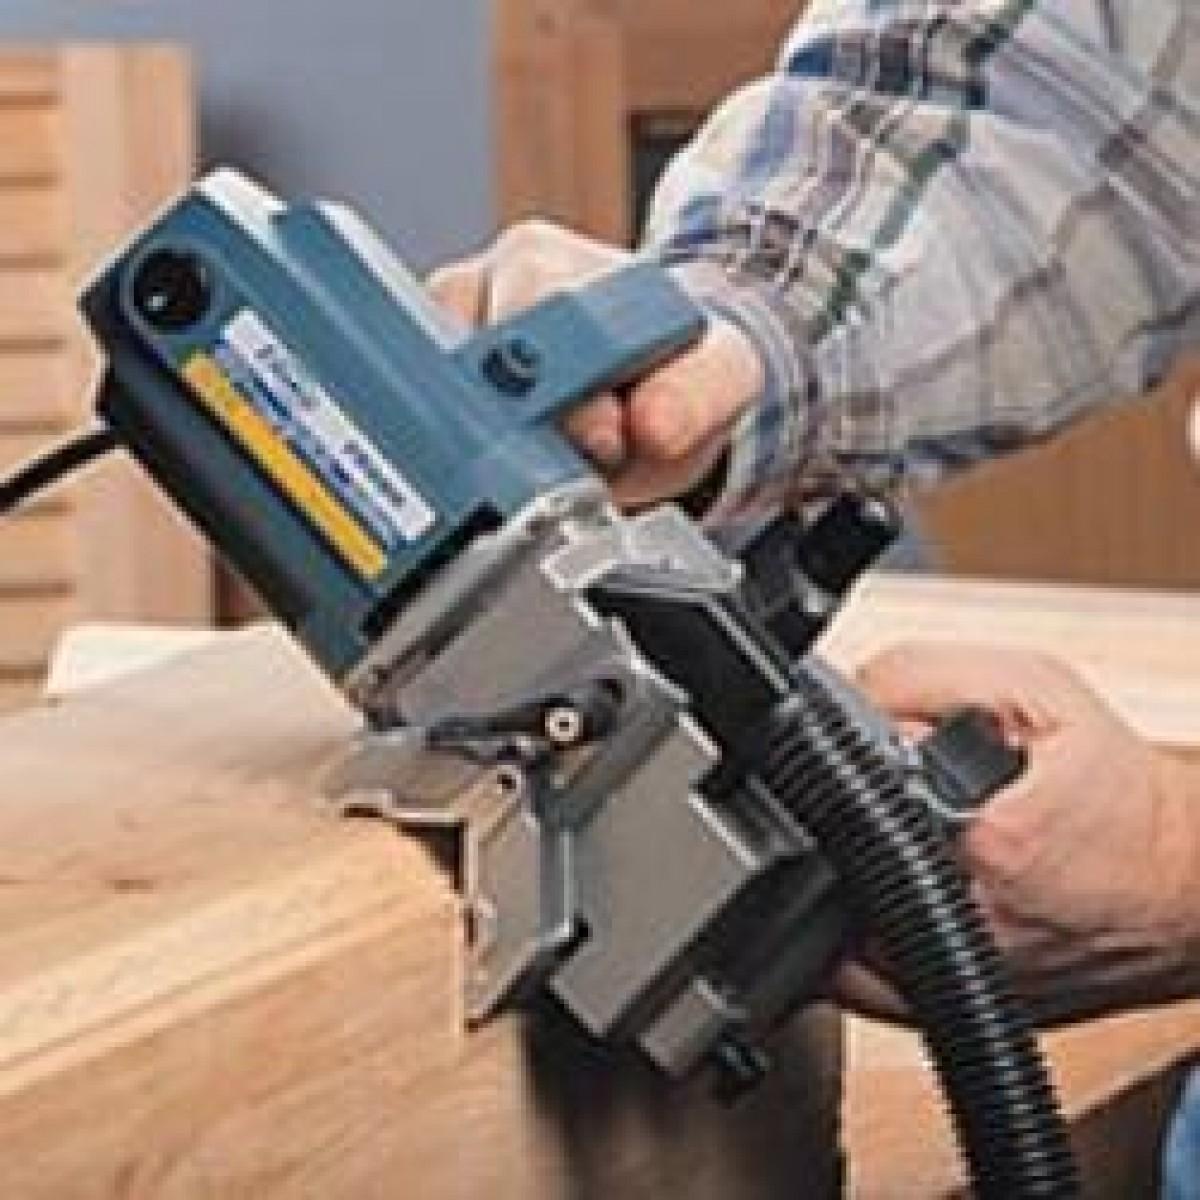 Virutex Hand Held Shaper Planers Woodworking Tools